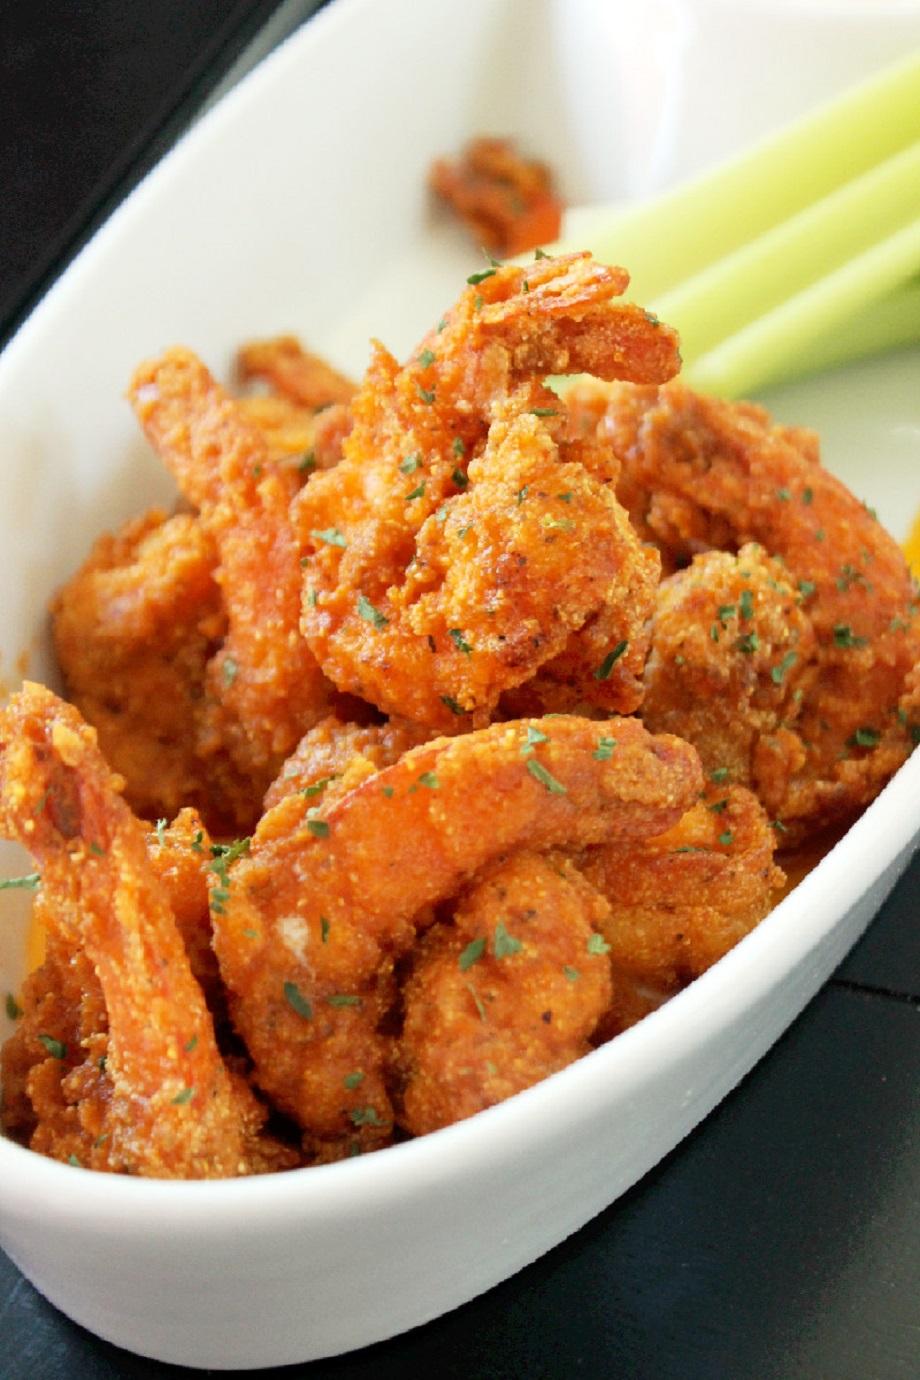 ... is roasted buffalo shrimp on caesar salad oven roasted buffalo shrimp